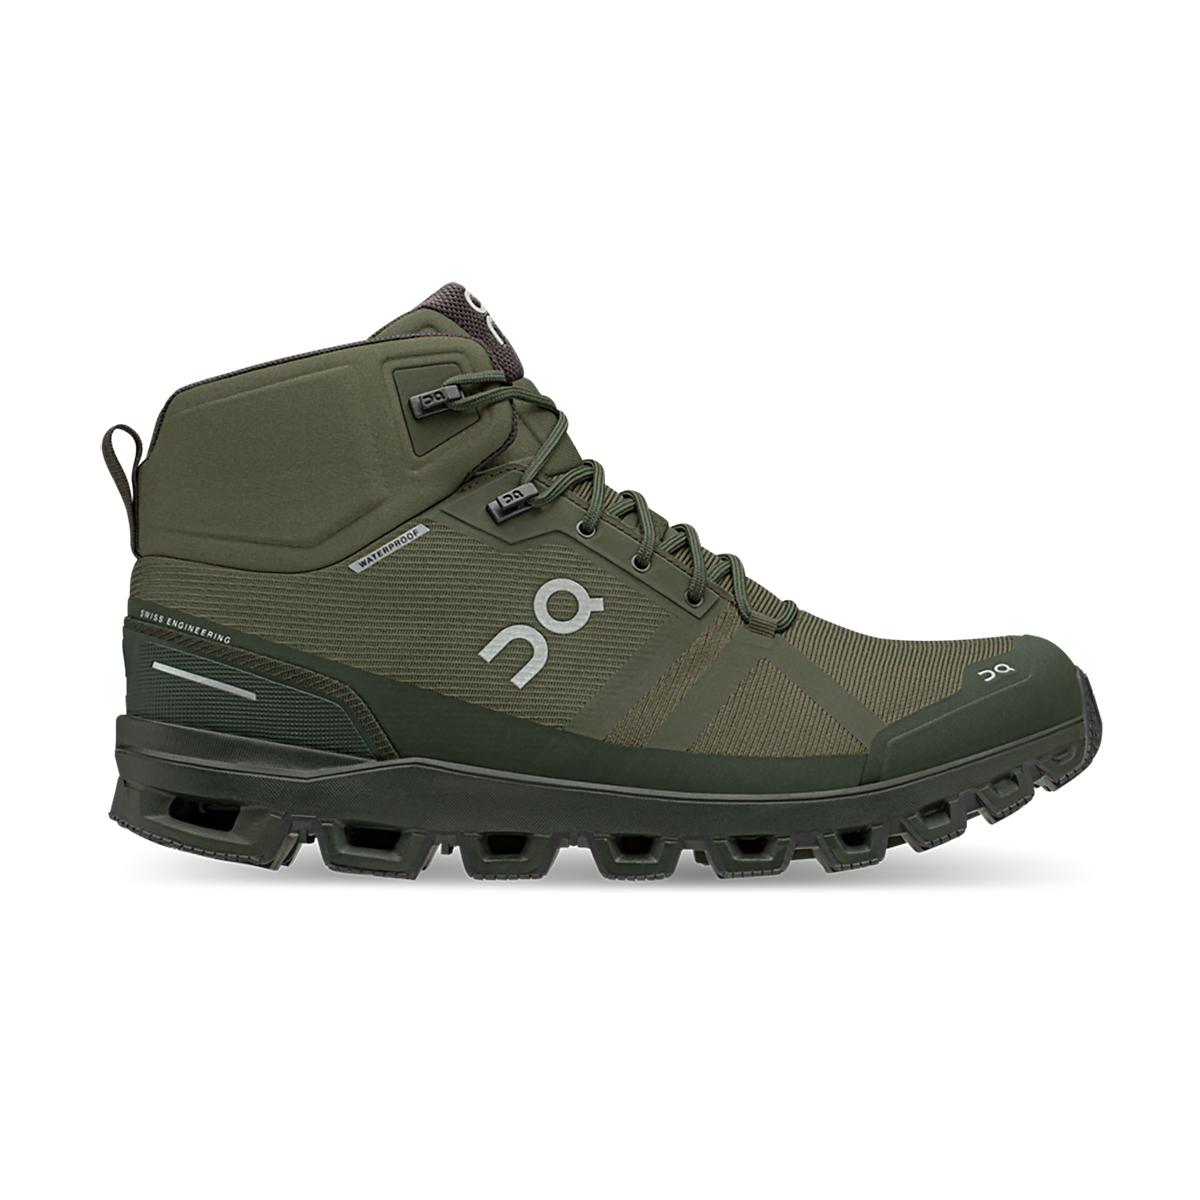 Men's On Cloudrock Waterproof Trail Running Shoe - Color: Jungle/Fir - Size: 7 - Width: Regular, Jungle/Fir, large, image 1